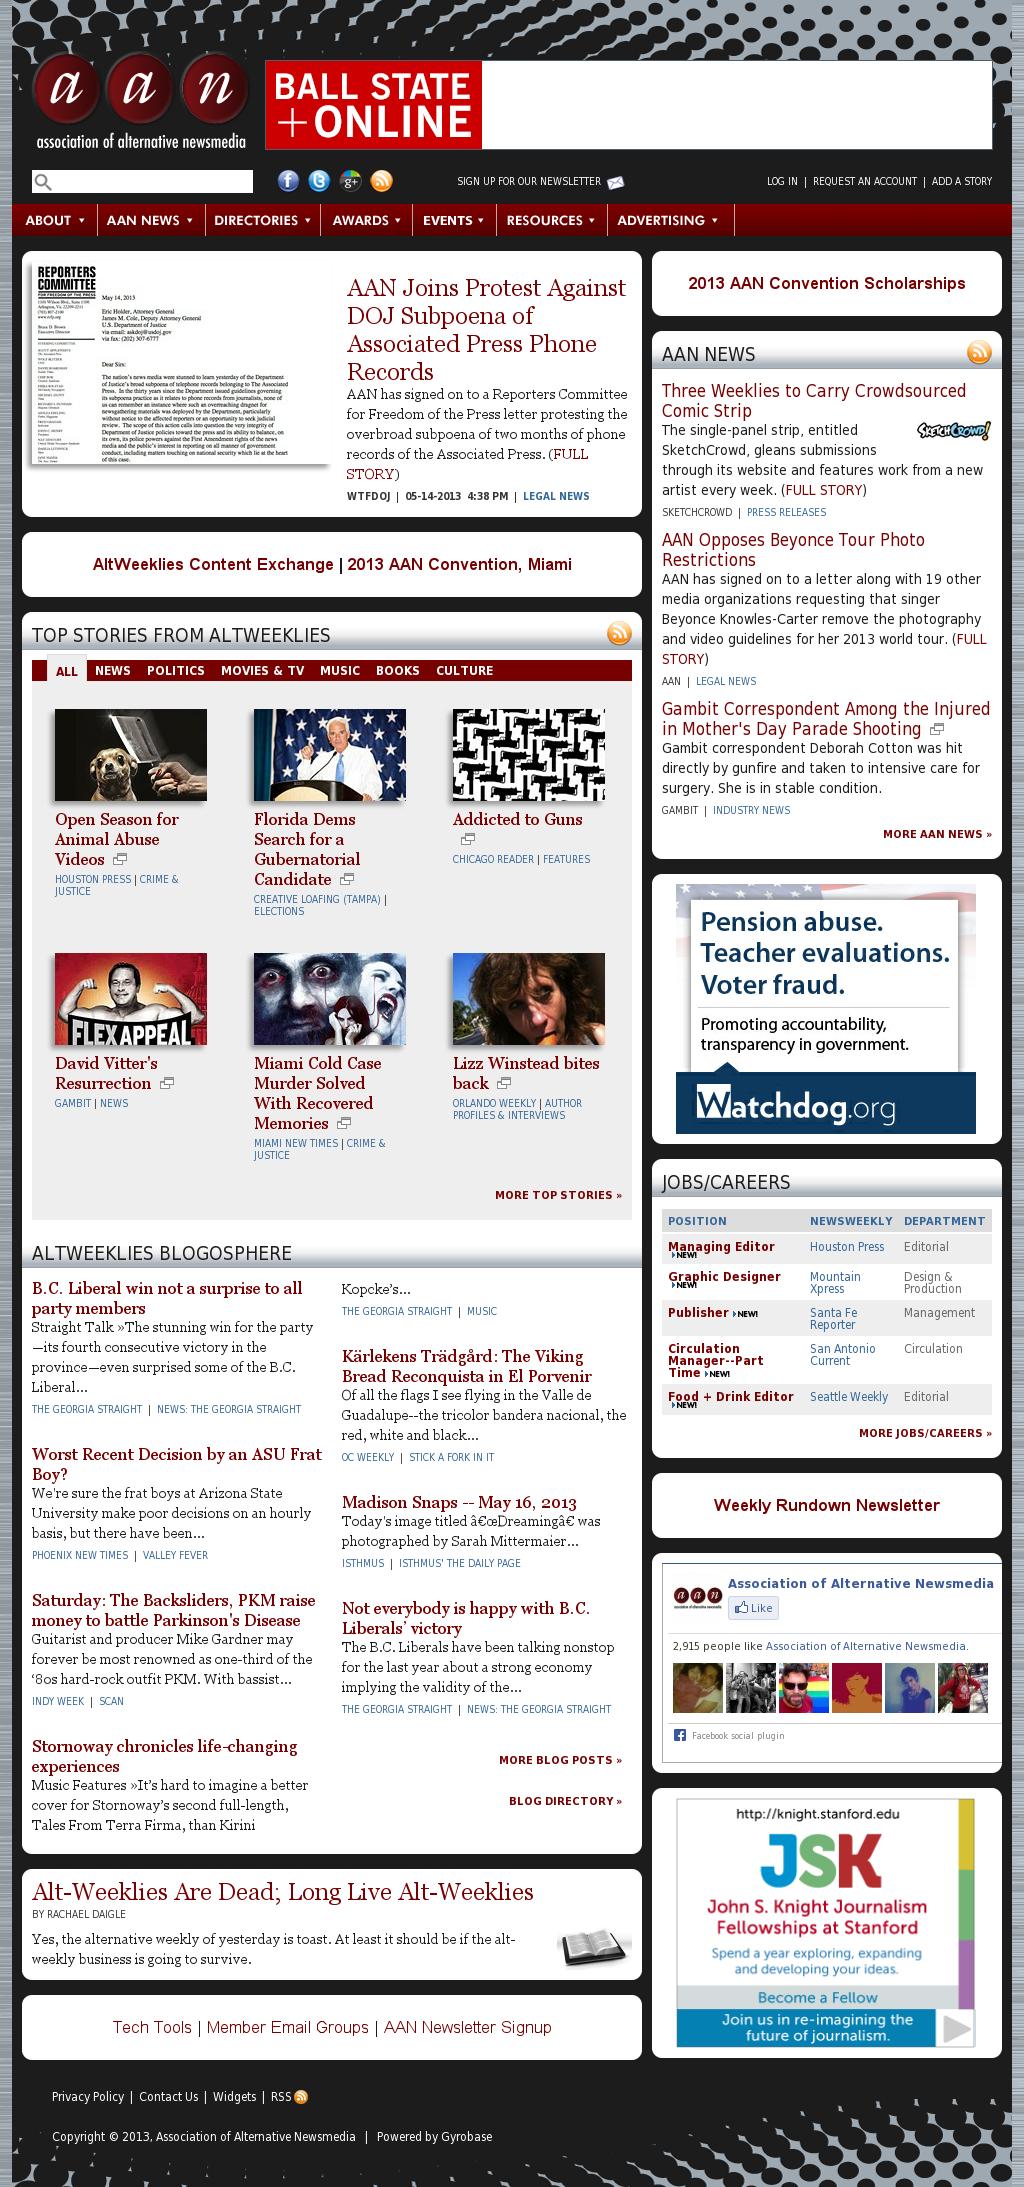 Association of Alternative Newsmedia at Thursday May 16, 2013, 7:01 p.m. UTC